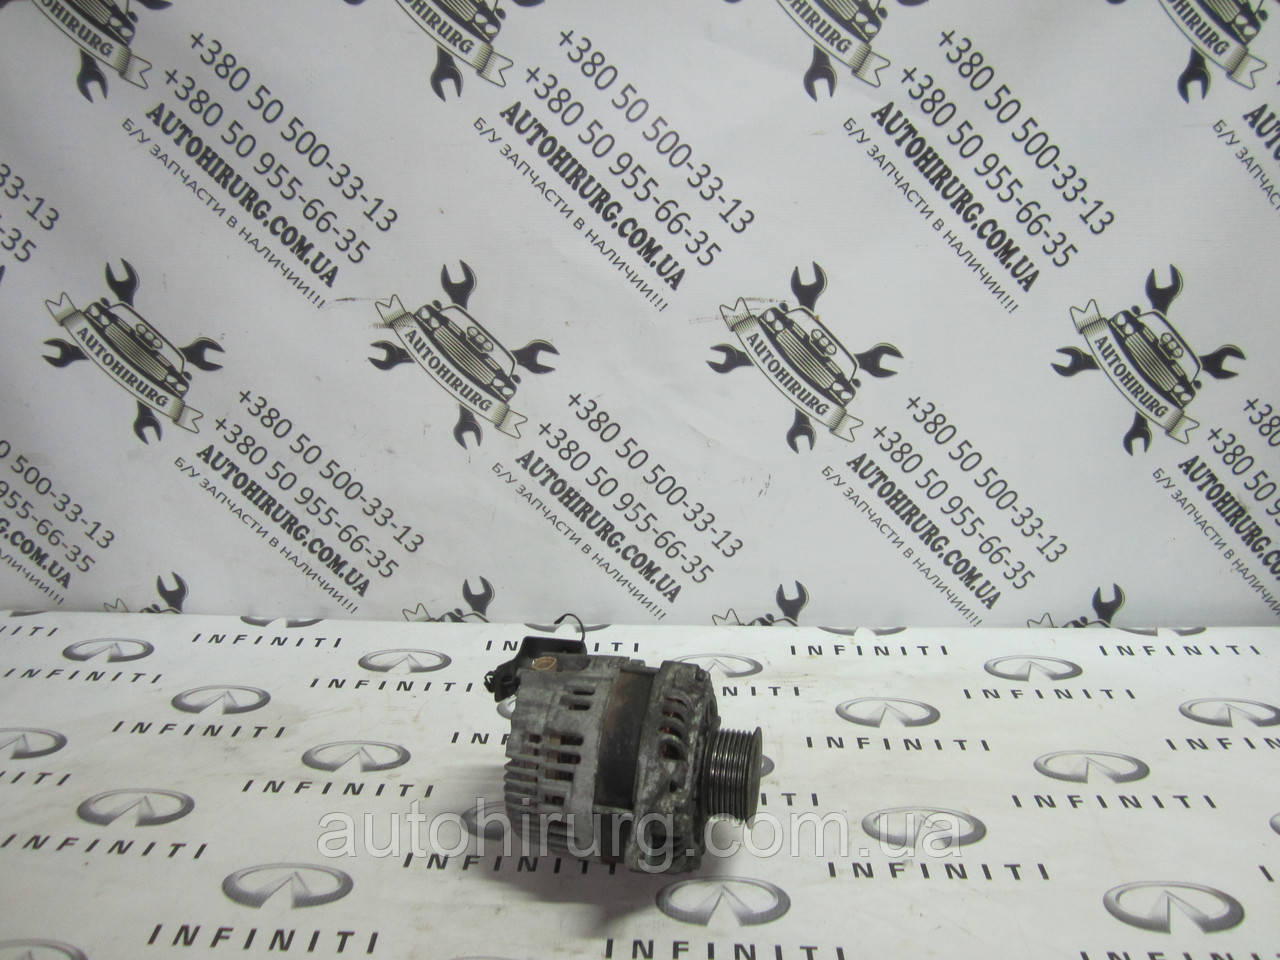 Генератор Infiniti Qx56 / Qx80 - Z62 (23100-1LA1A), фото 1